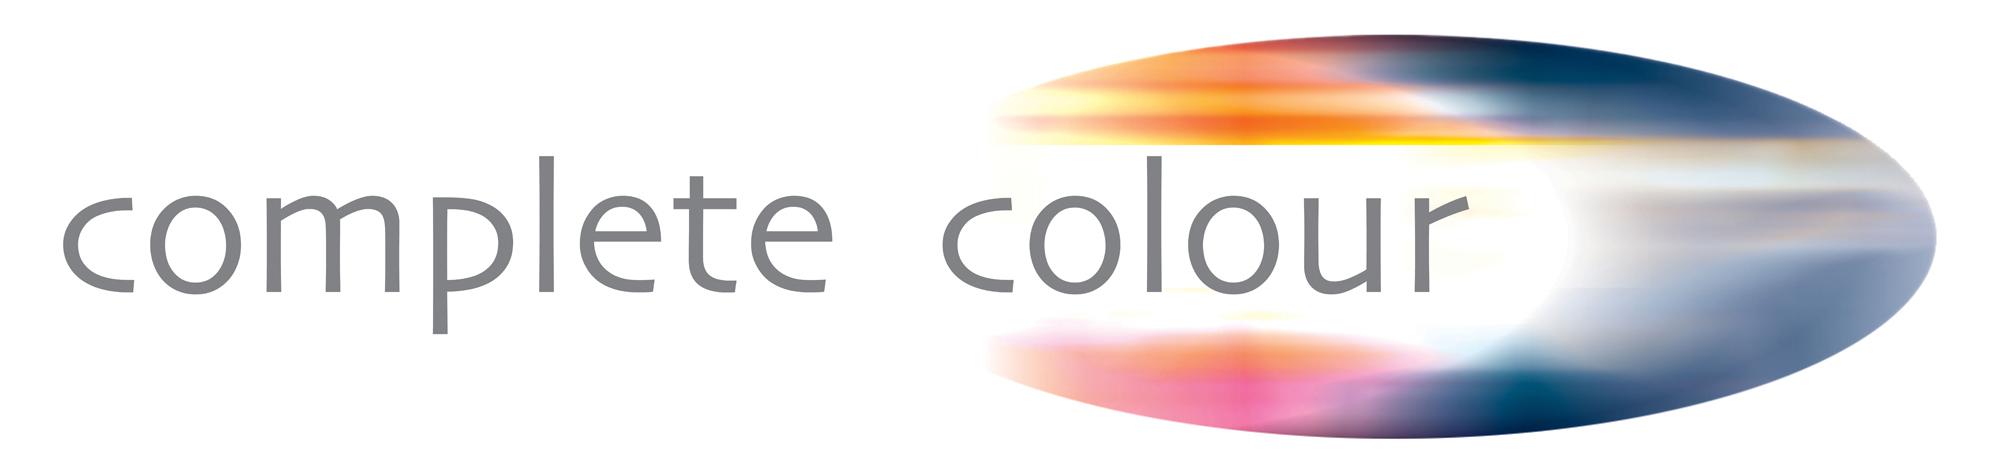 C61844_CompleteColour_Logo_1500x400